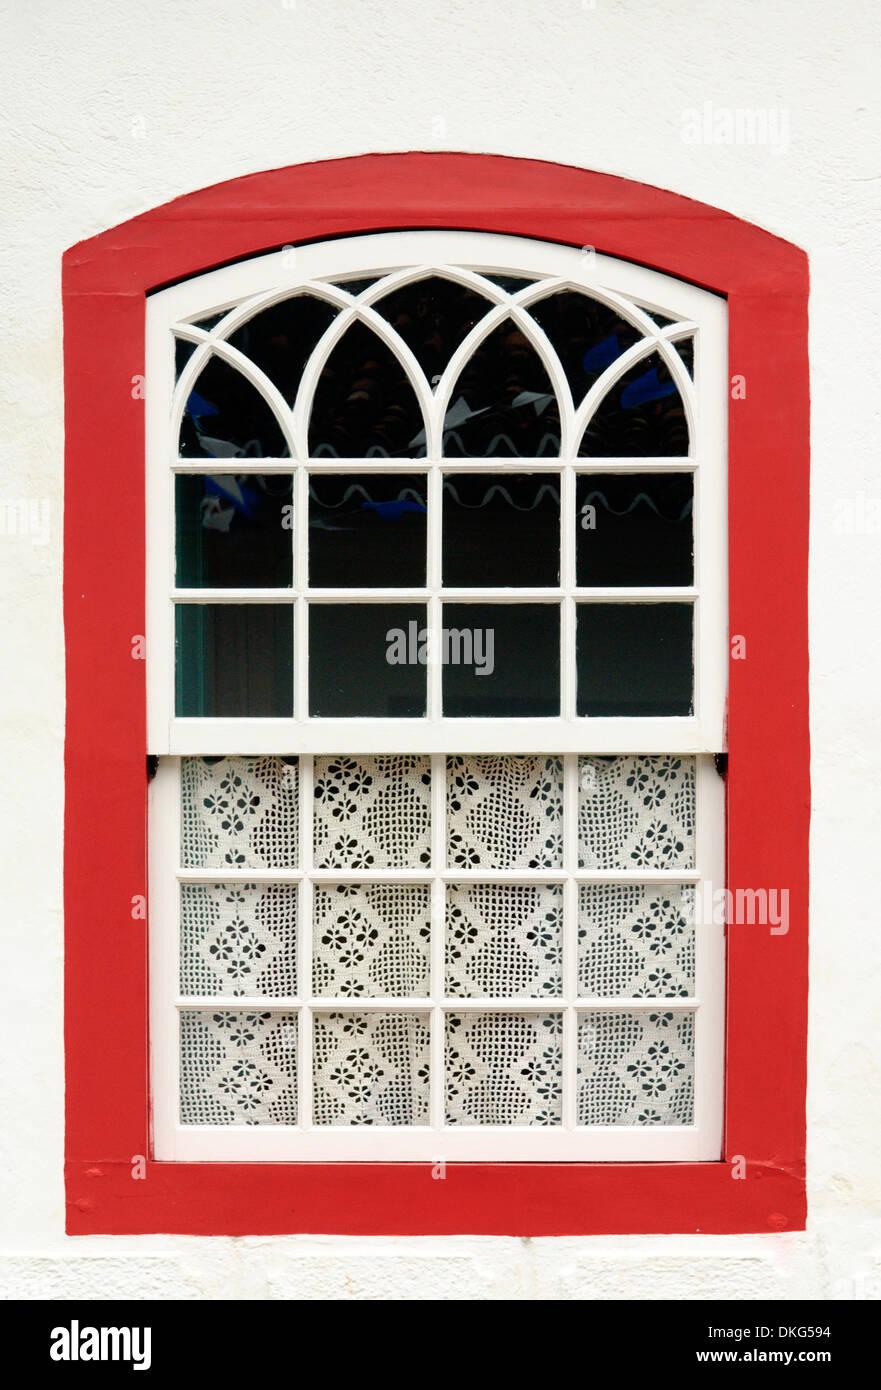 Lovingly decorated house window in Paraty's historic center; Paraty, Espirito Santo, Brazil. - Stock Image